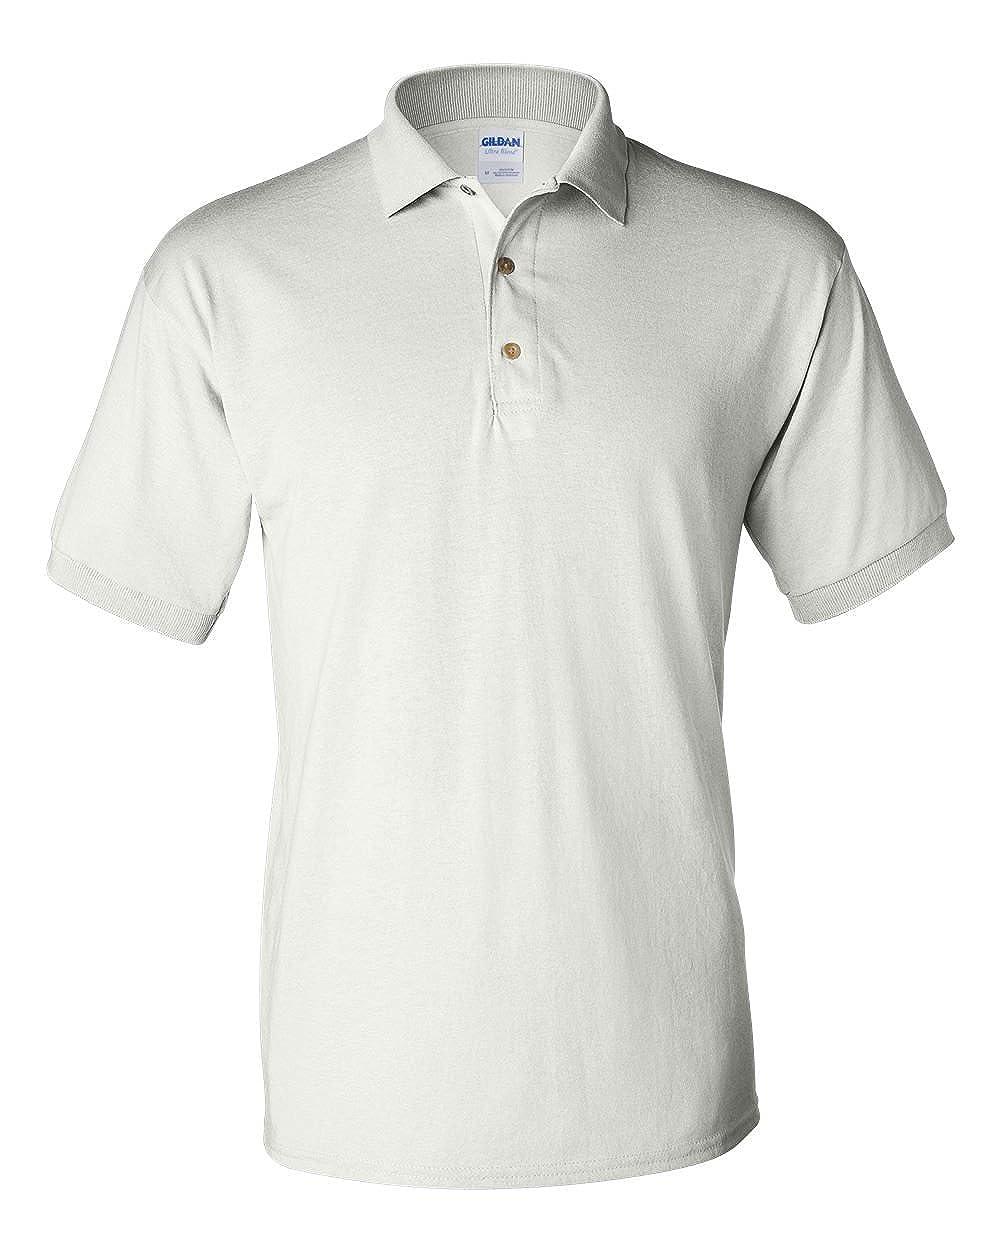 Pack of 12 Gildan 6 oz 5XL White G880 50//50 Jersey Polo